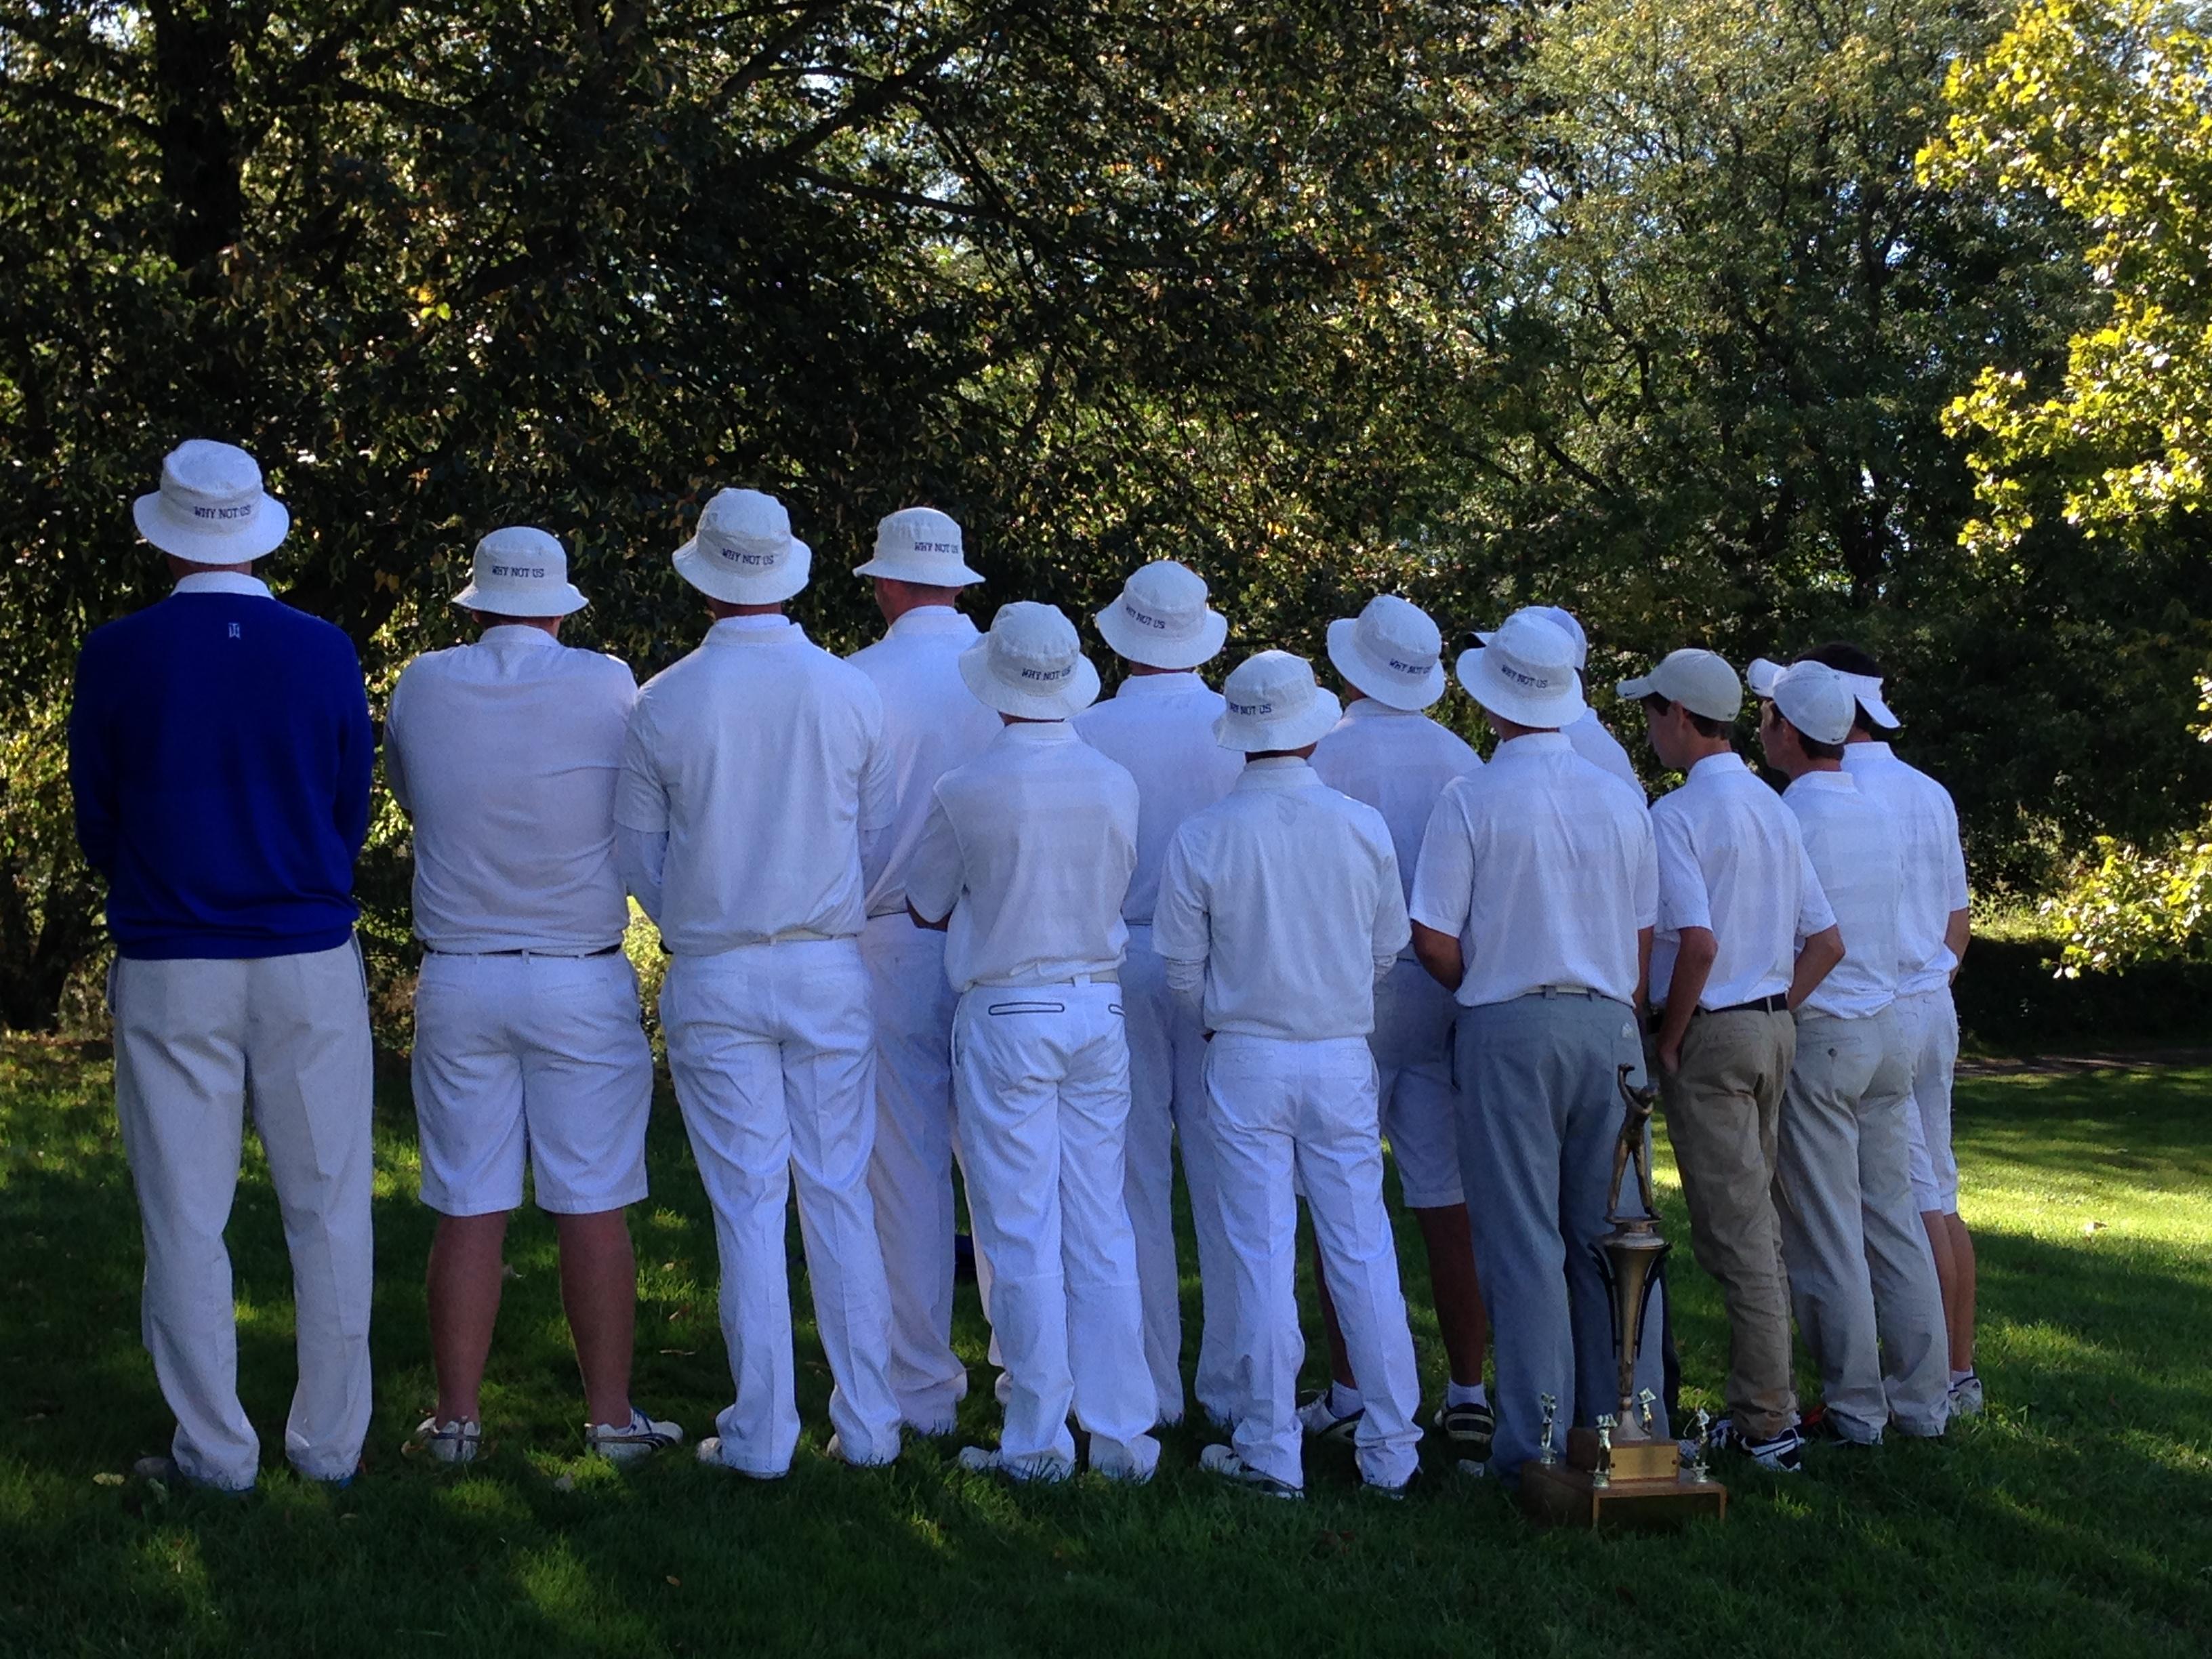 back of bucket hats on golf team